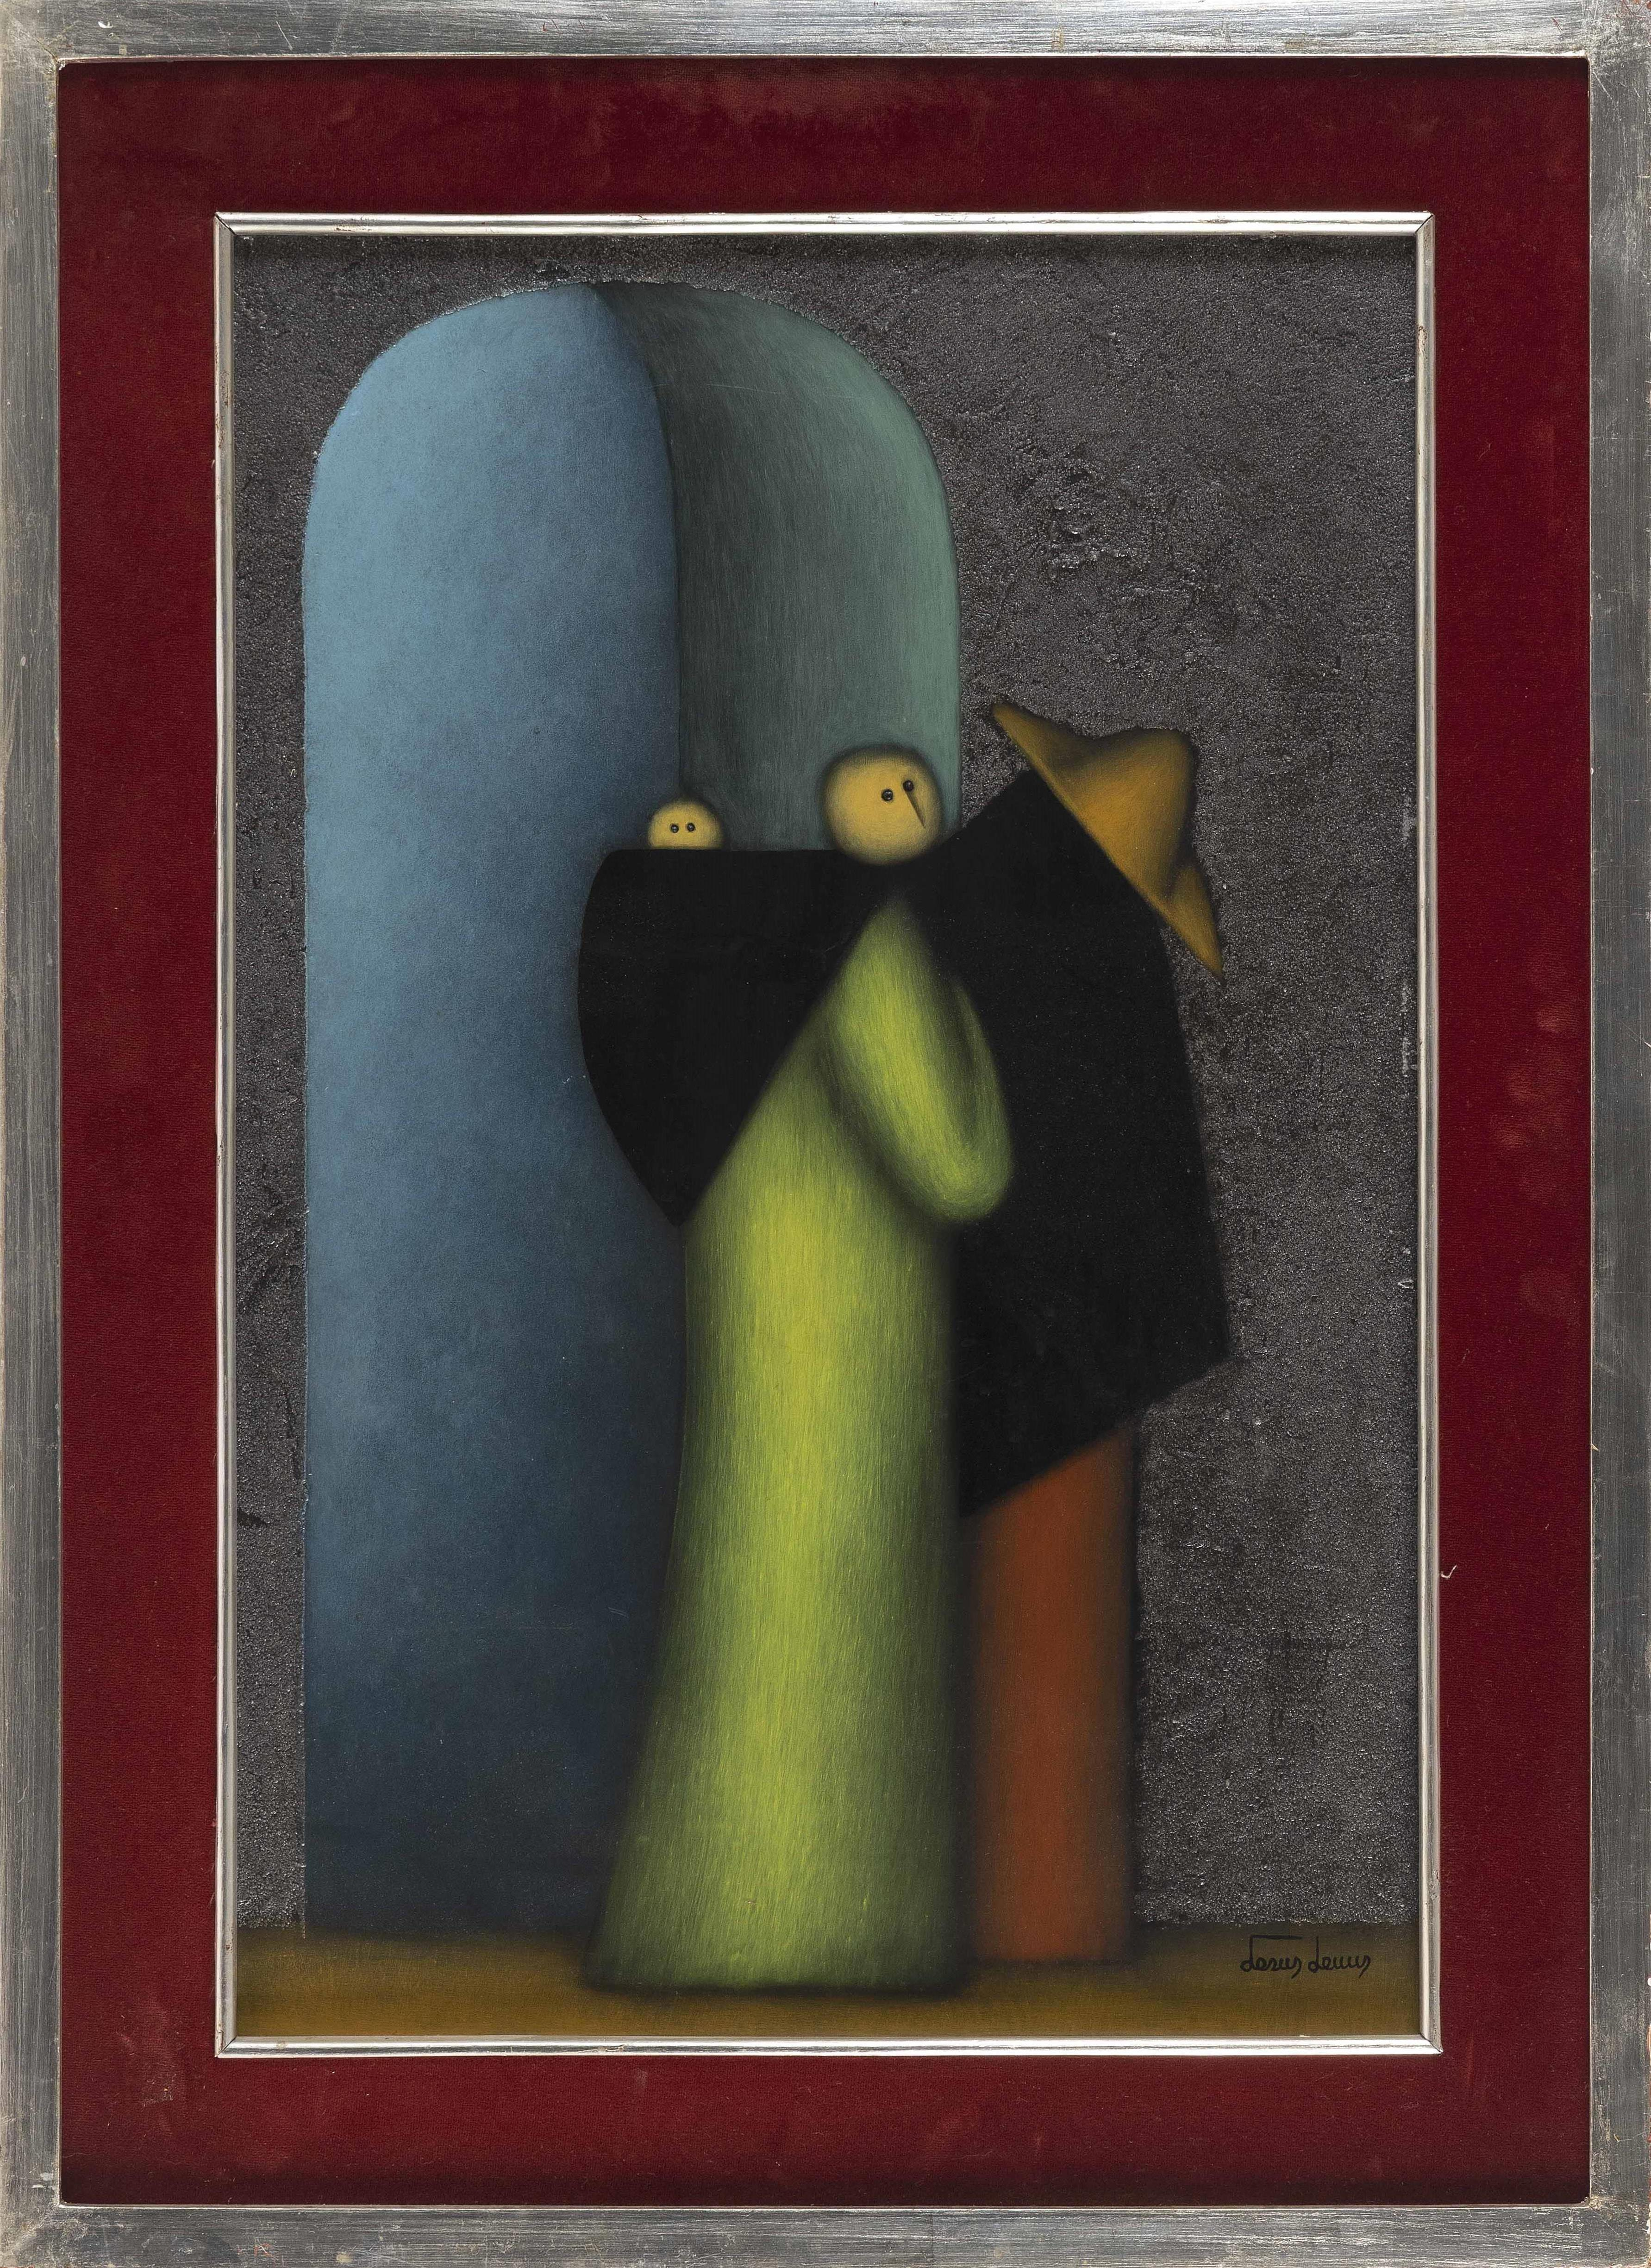 JESUS MARIANO LEUUS (Texas/Mexico, b. 1948), Figures., Oil on board, 24